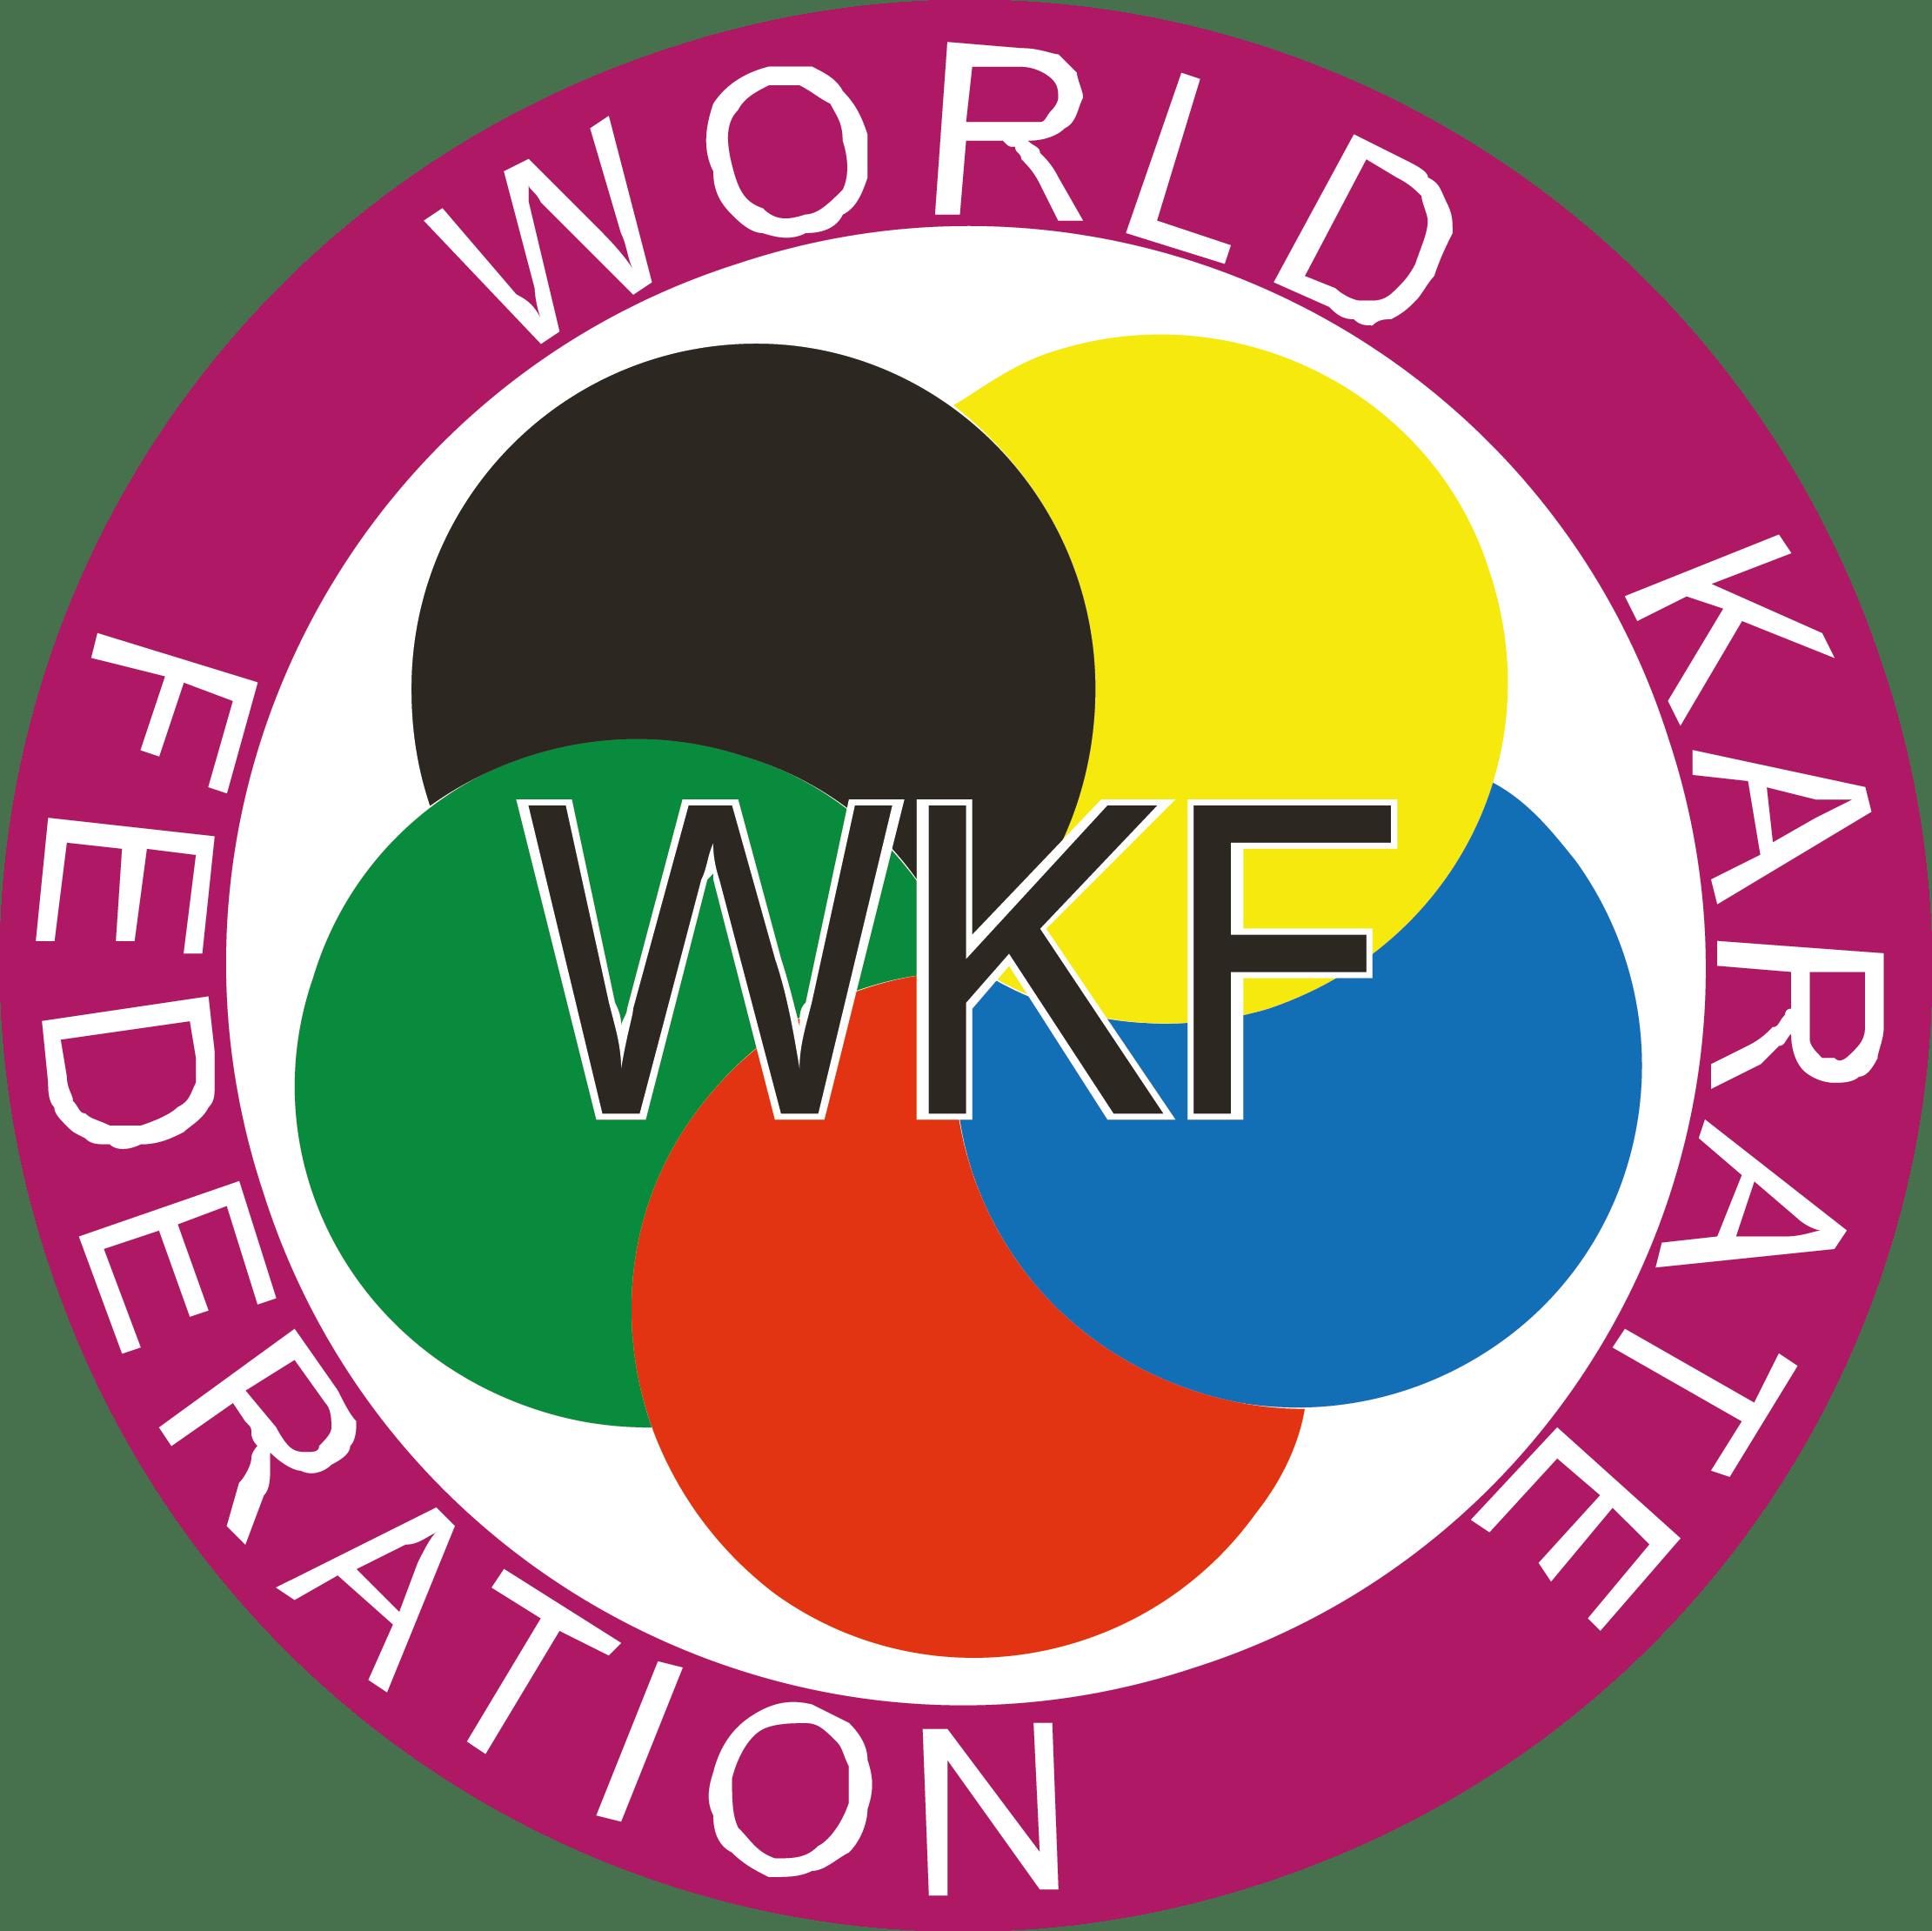 wkf world karate federation logo wkf net png svg download logo rh freelogovectors net karate logo photo karate logo shotokan